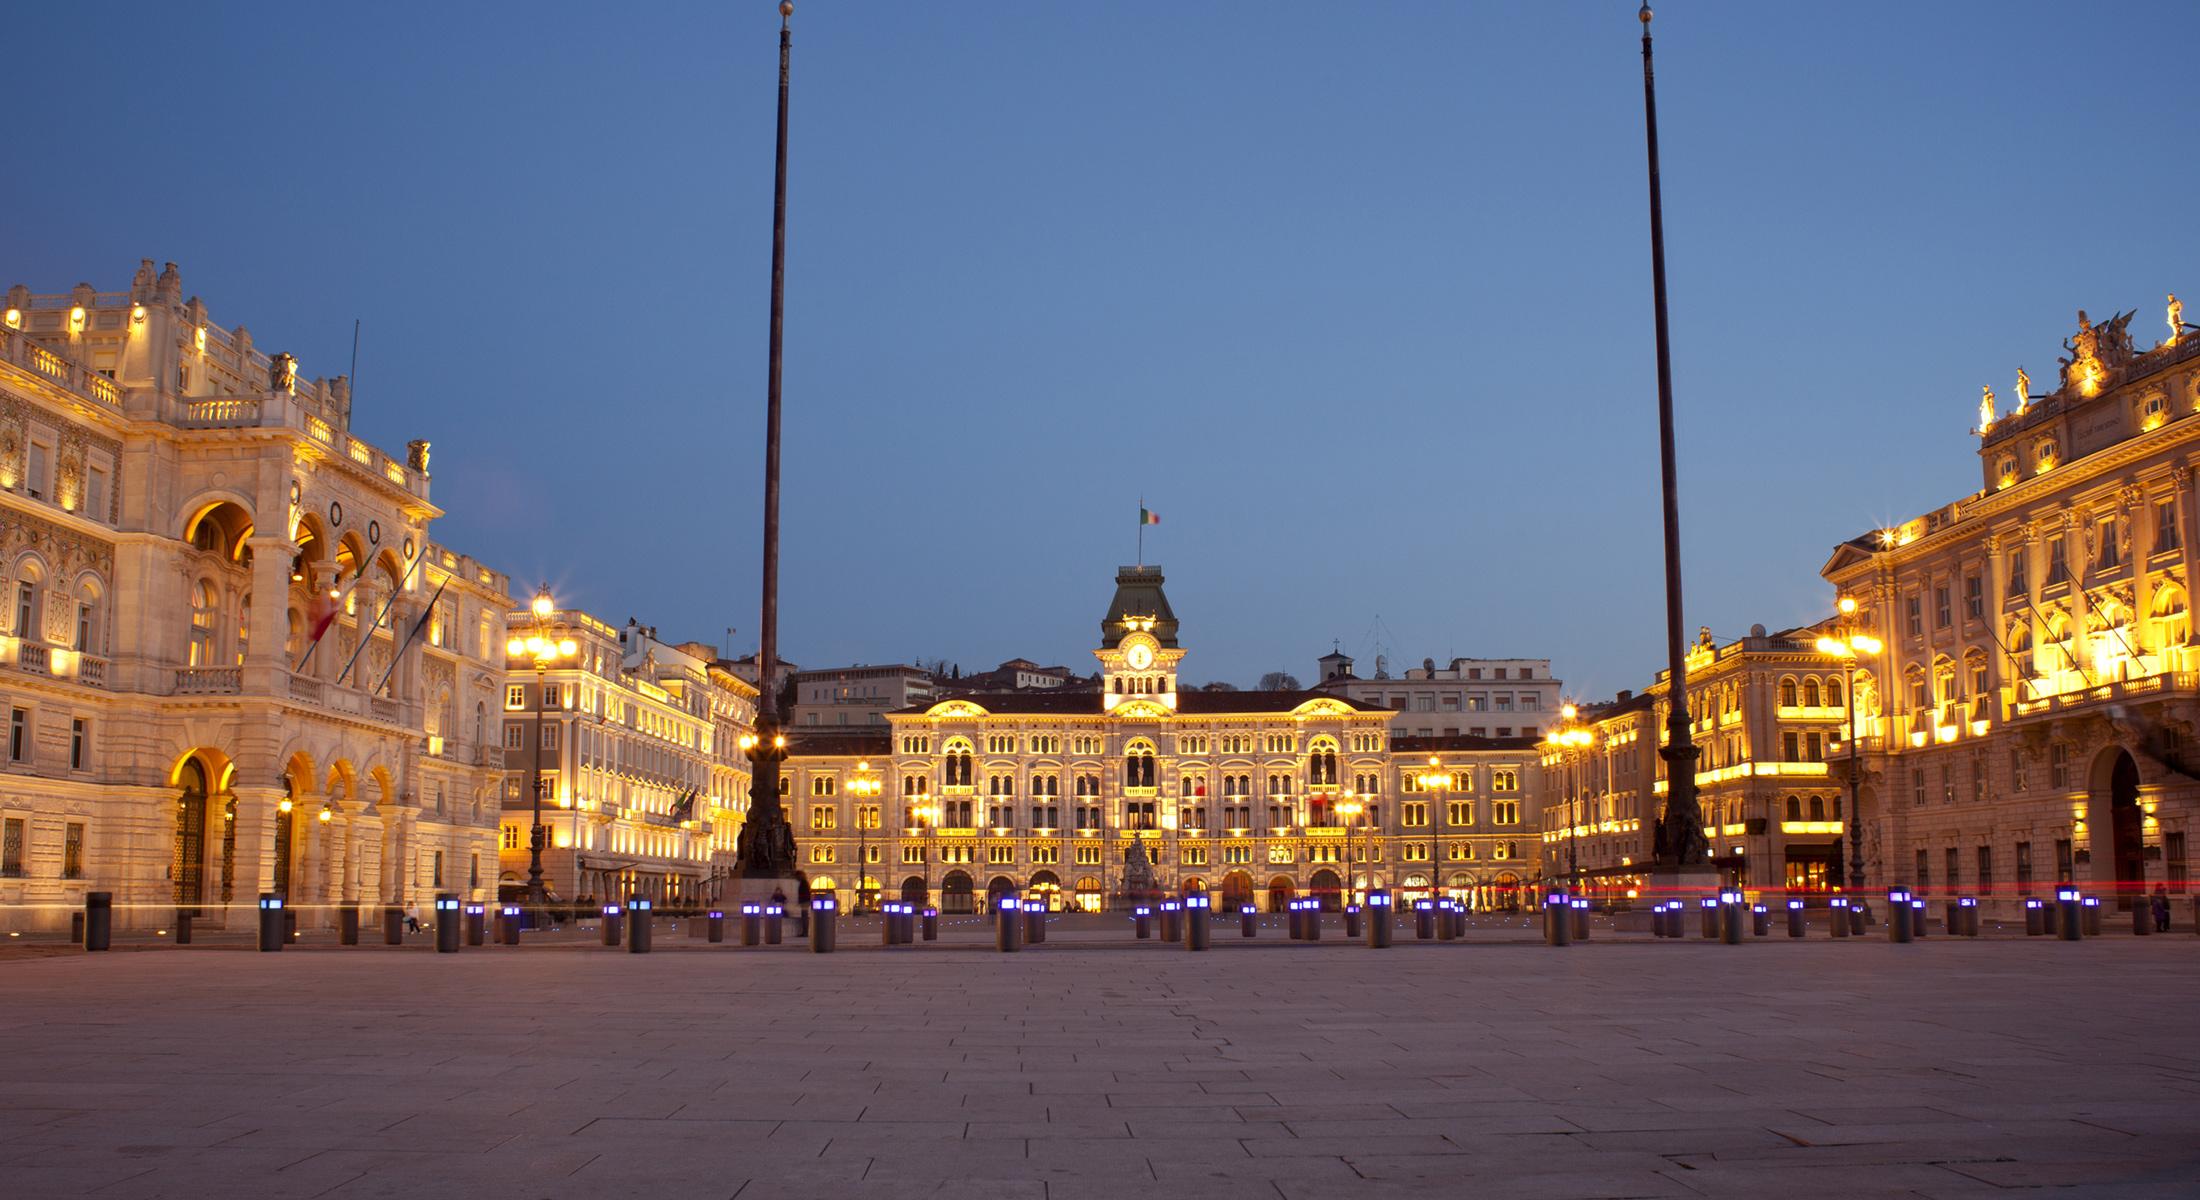 Hotel James Joyce a Trieste Prenotazione di un hotel in